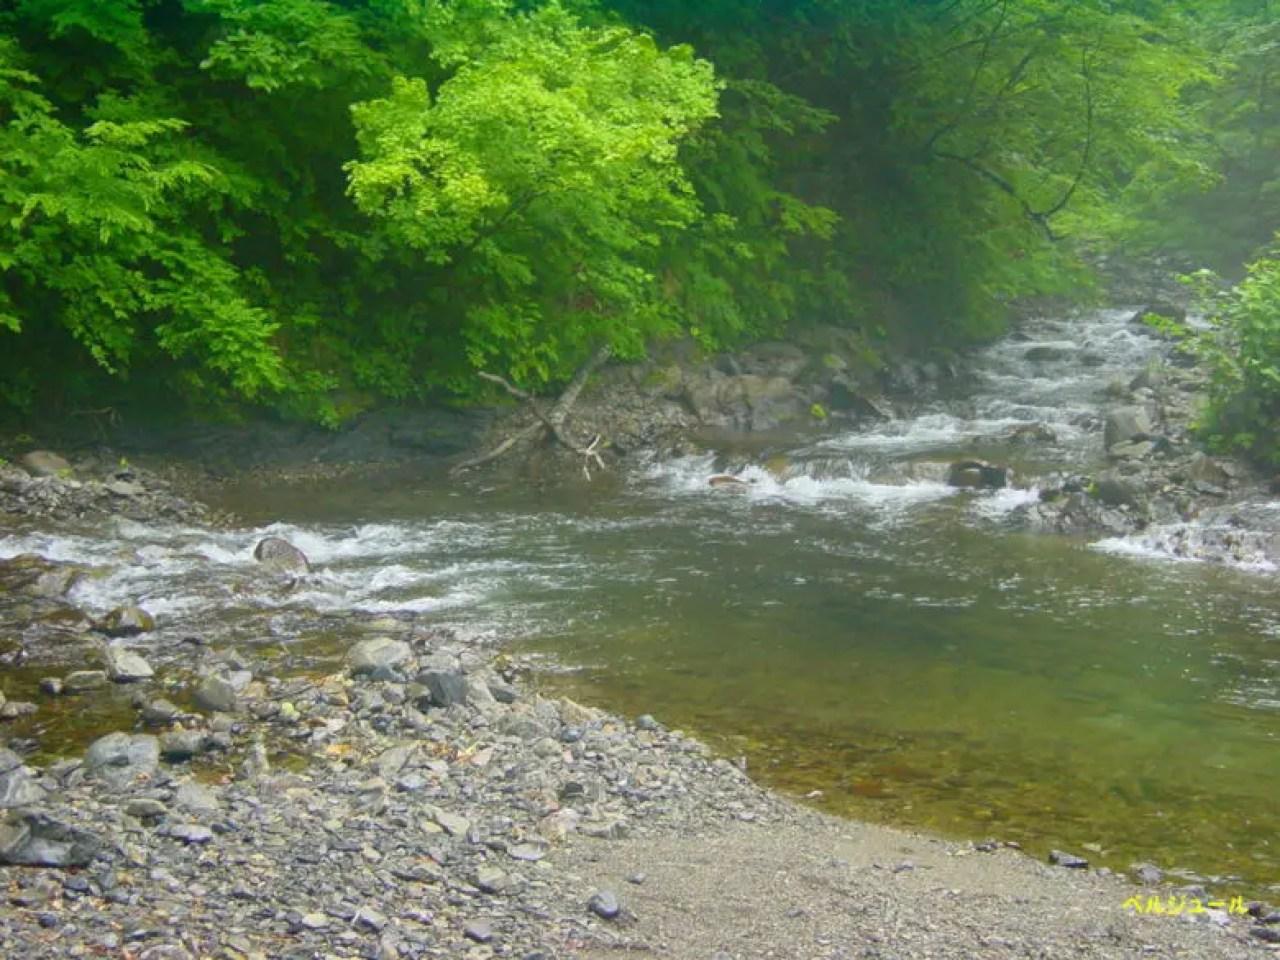 tokuyama00014 - 揖斐川上流・旧徳山村での岩魚釣り